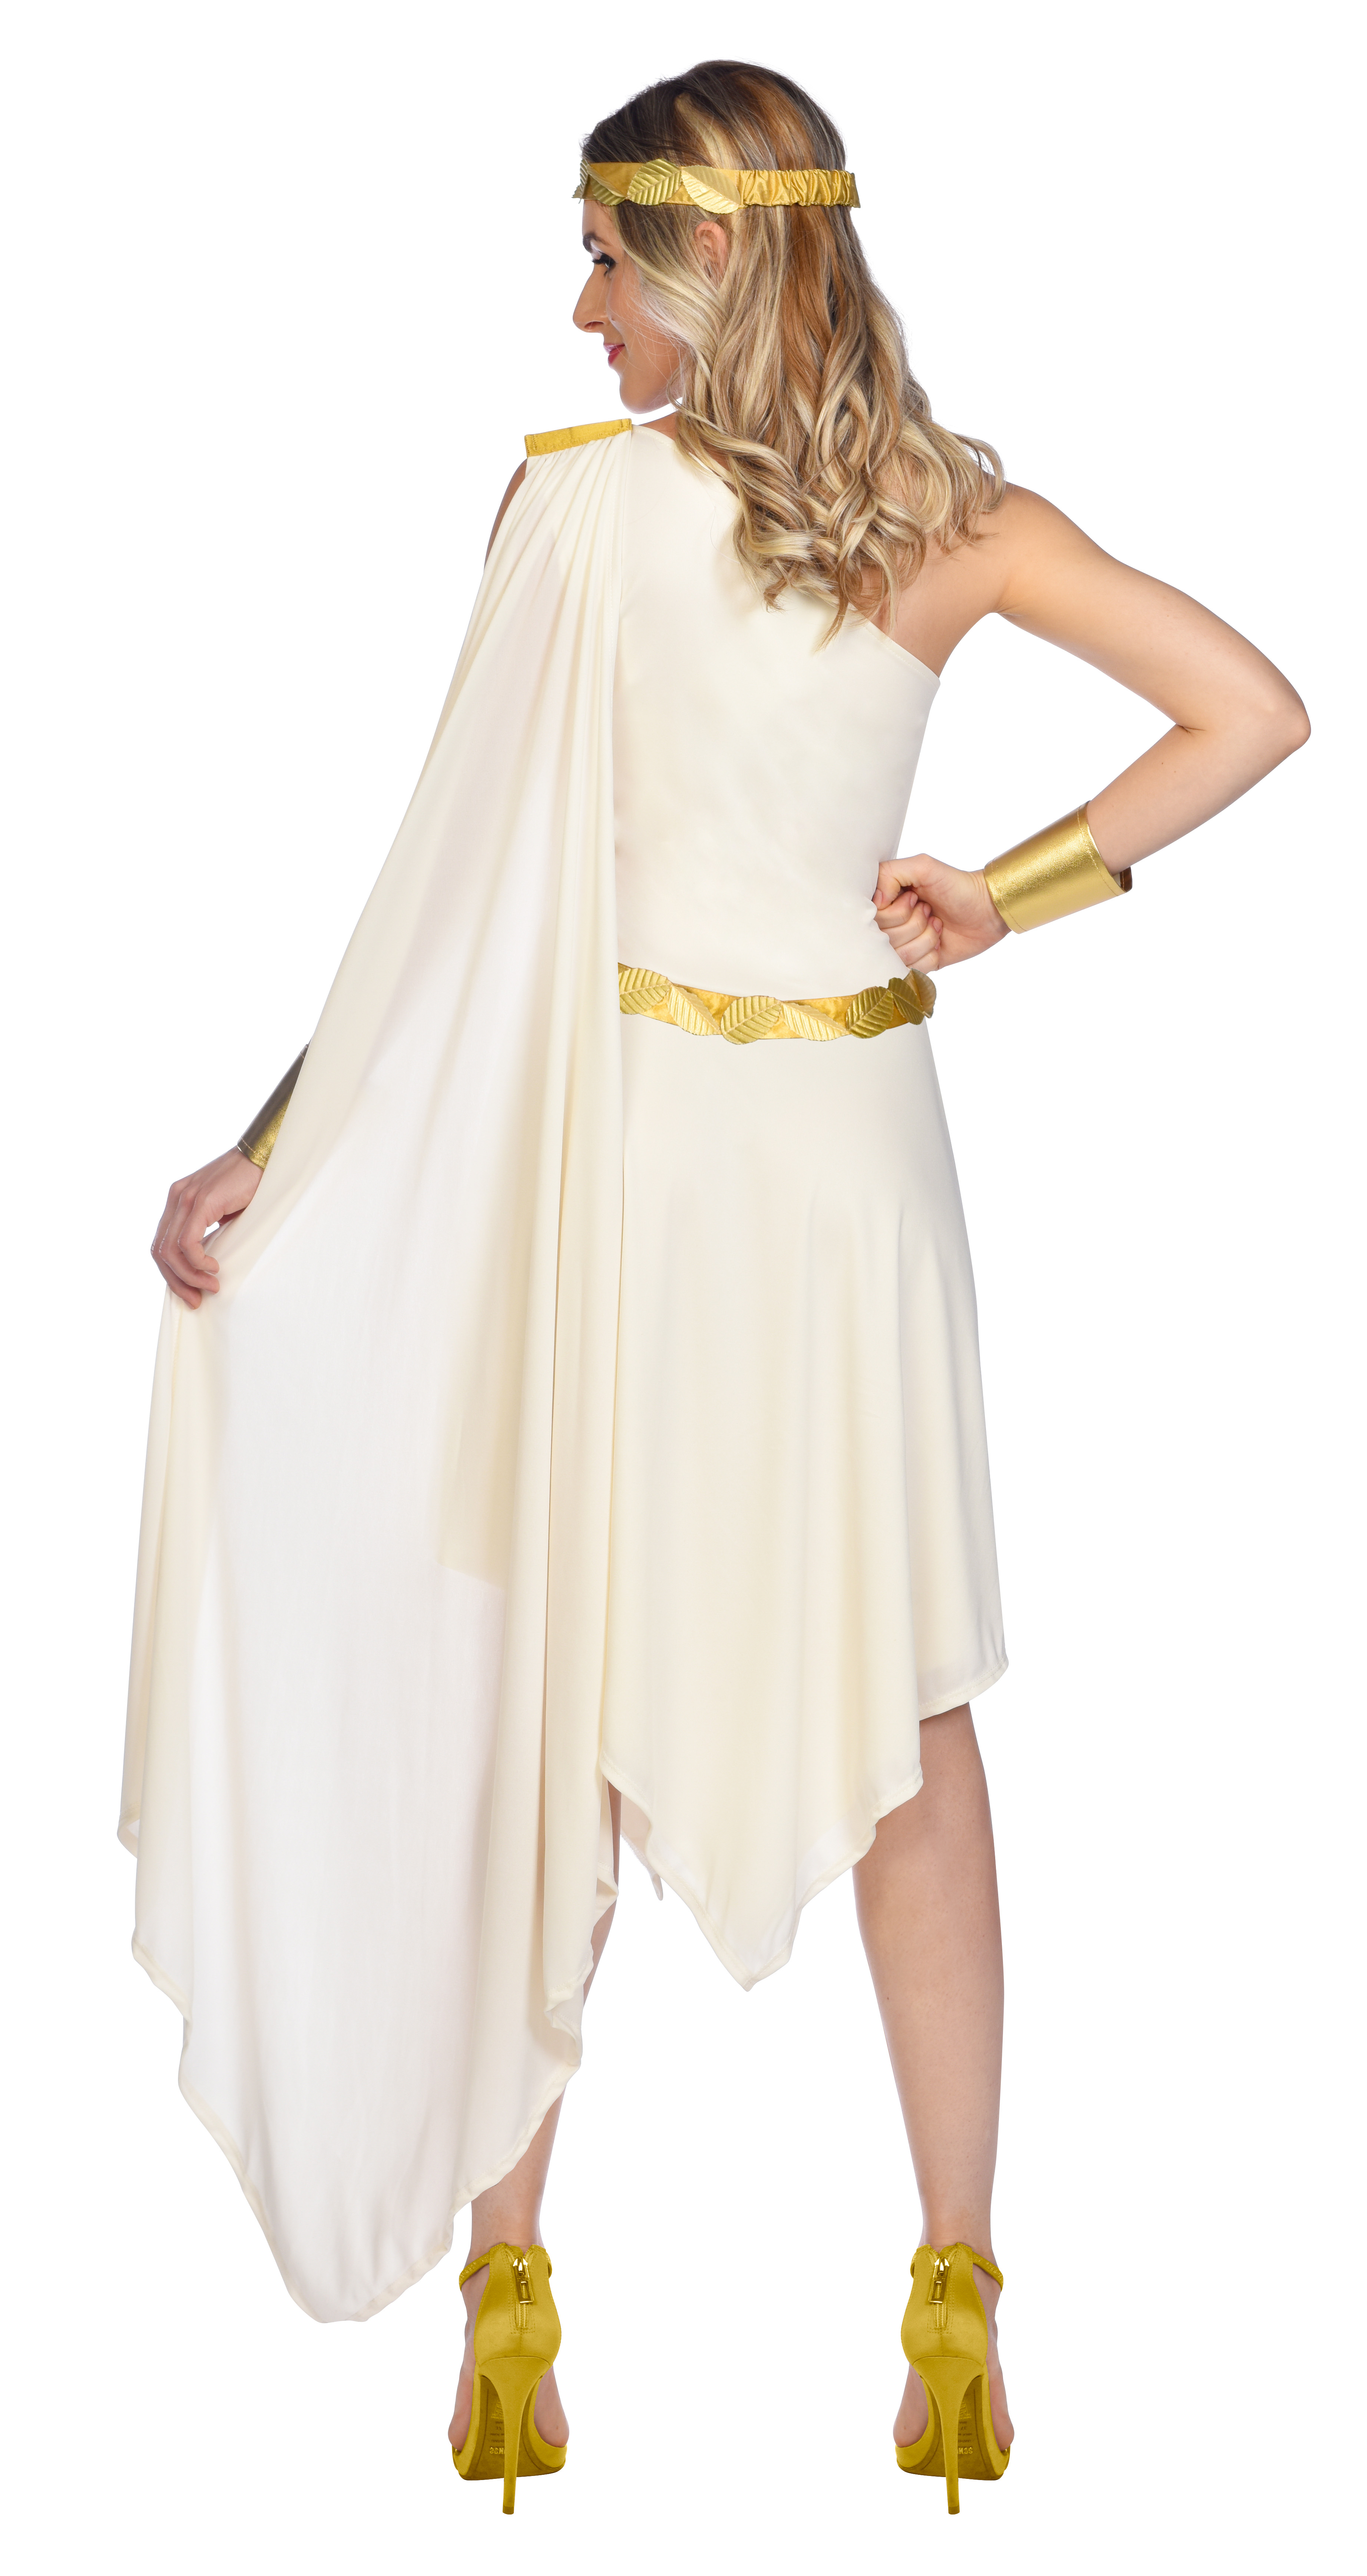 Indexbild 10 - Adult Ladies Golden Goddess Gladiator Greek Roman Toga Fancy Dress Costume New